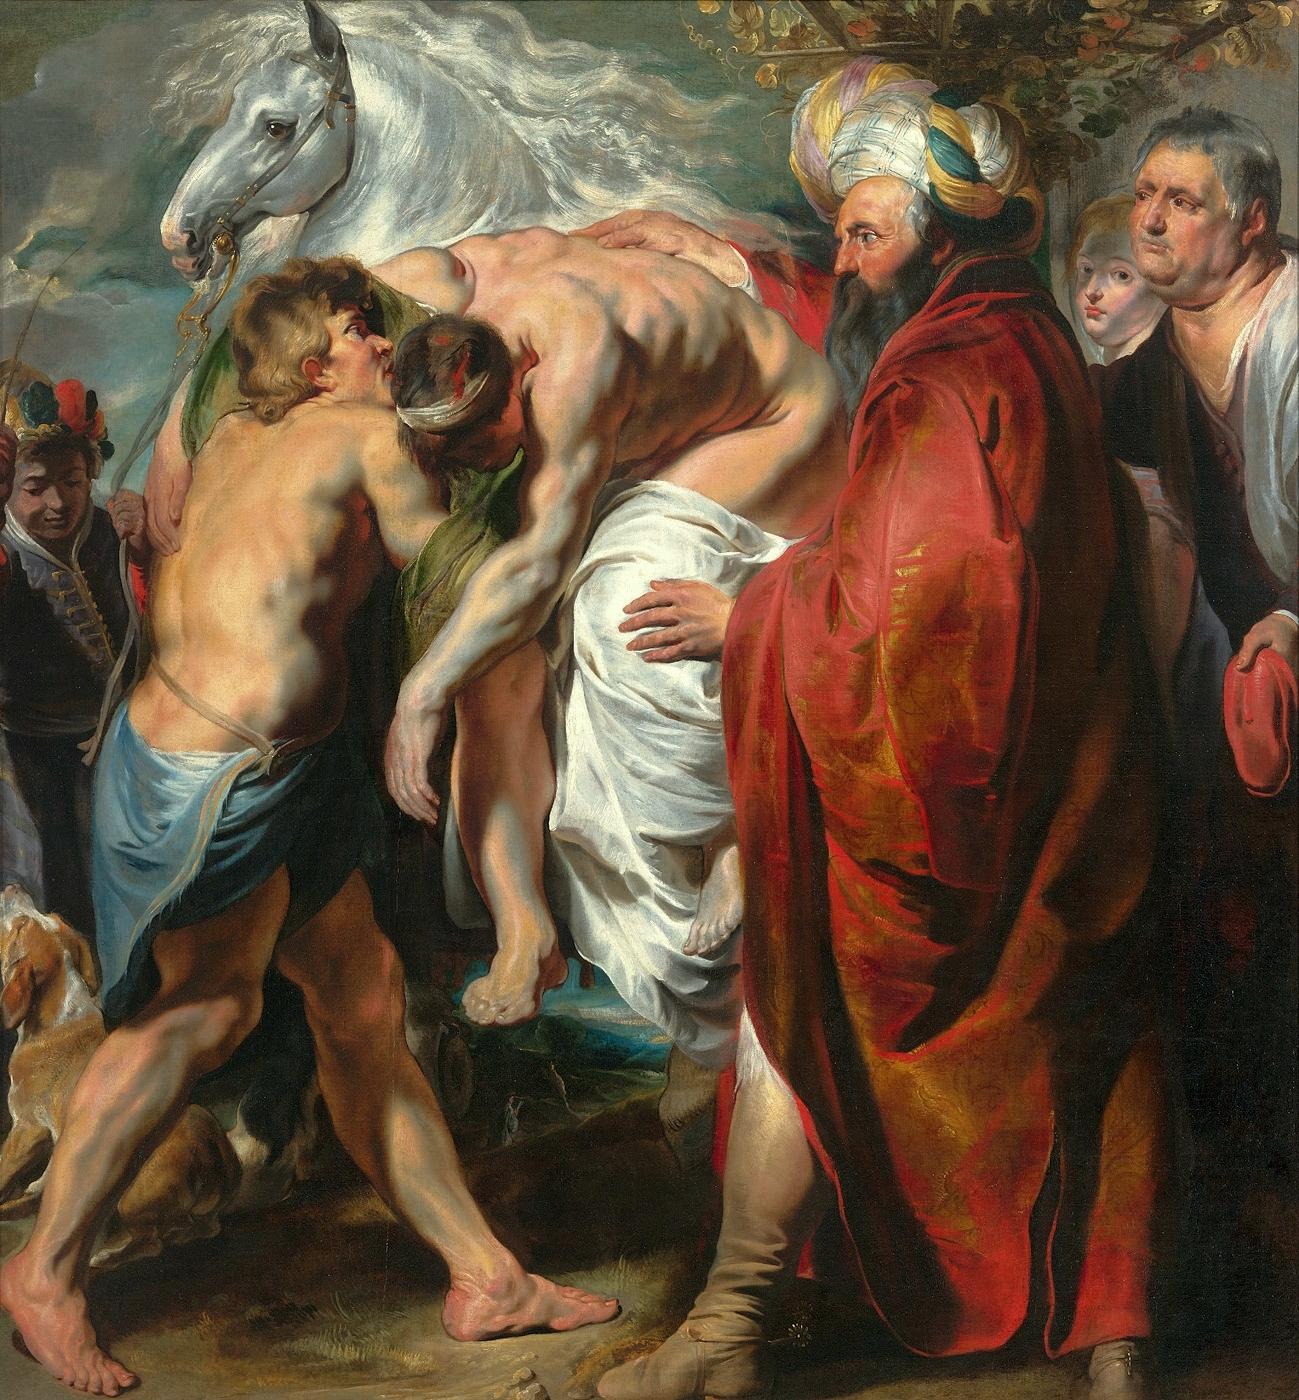 Parable of the Good Samaritan - Wikipedia